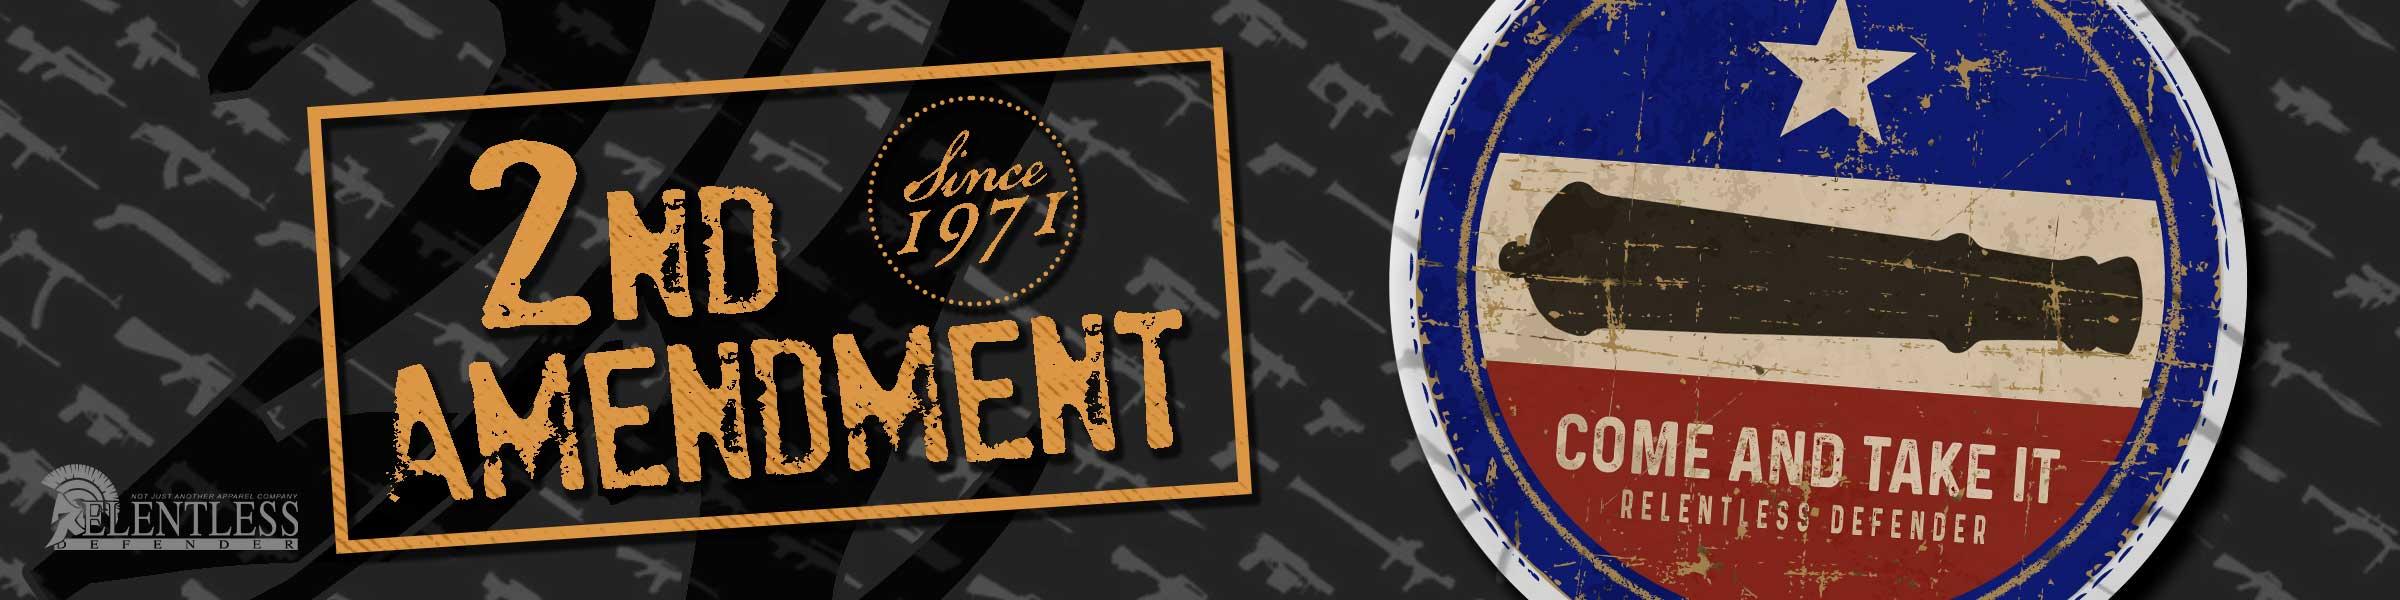 2nd Amendment Collection